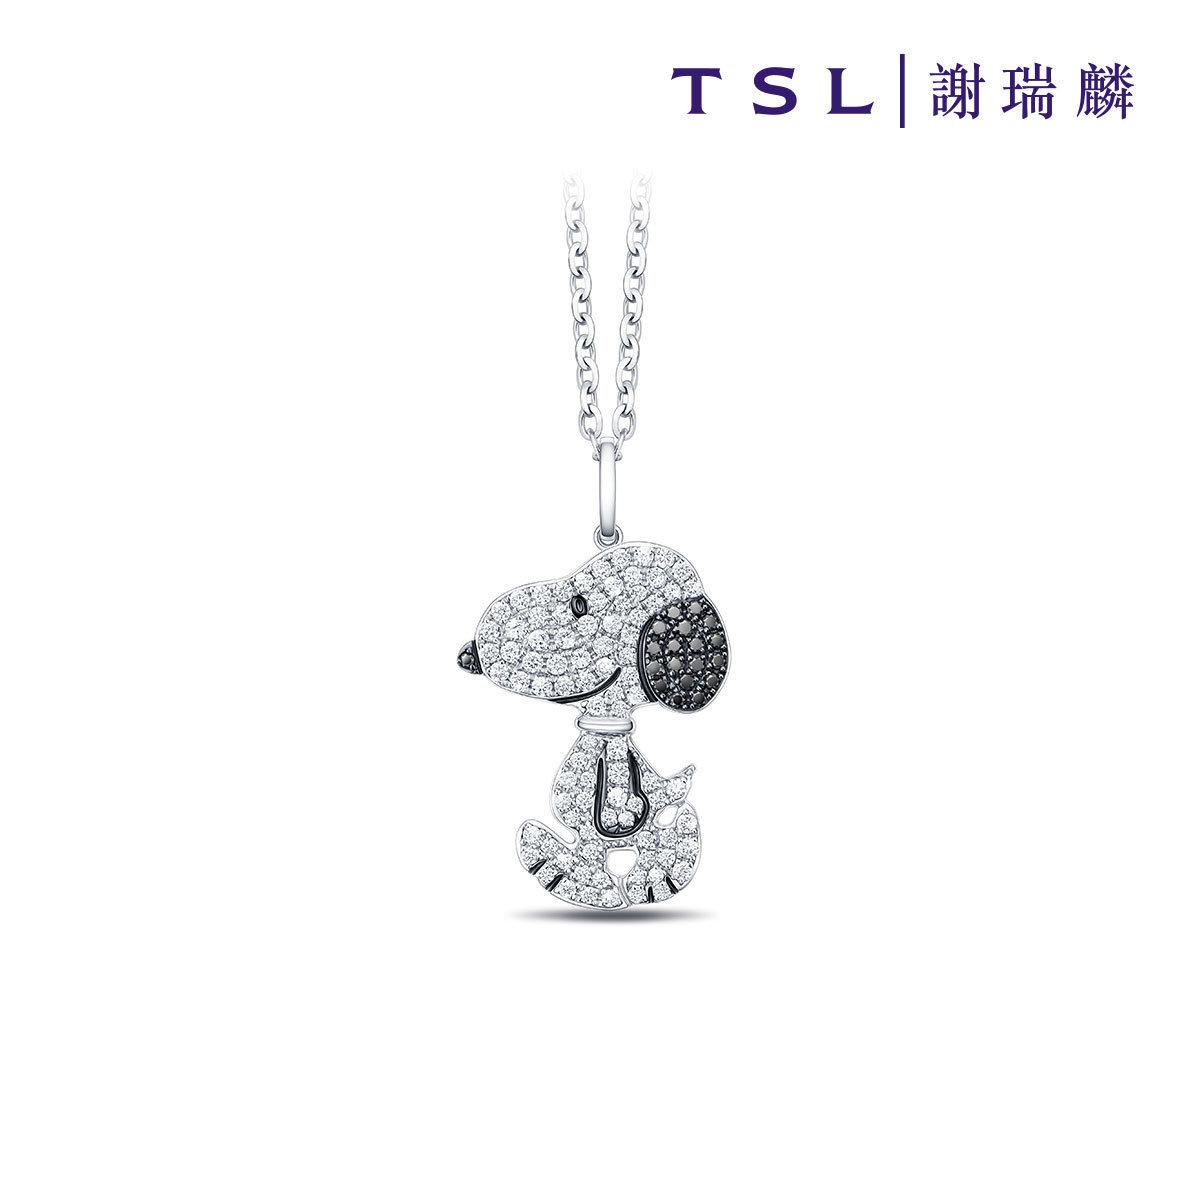 Snoopy 18K White Gold With Black and White Diamond Pendant